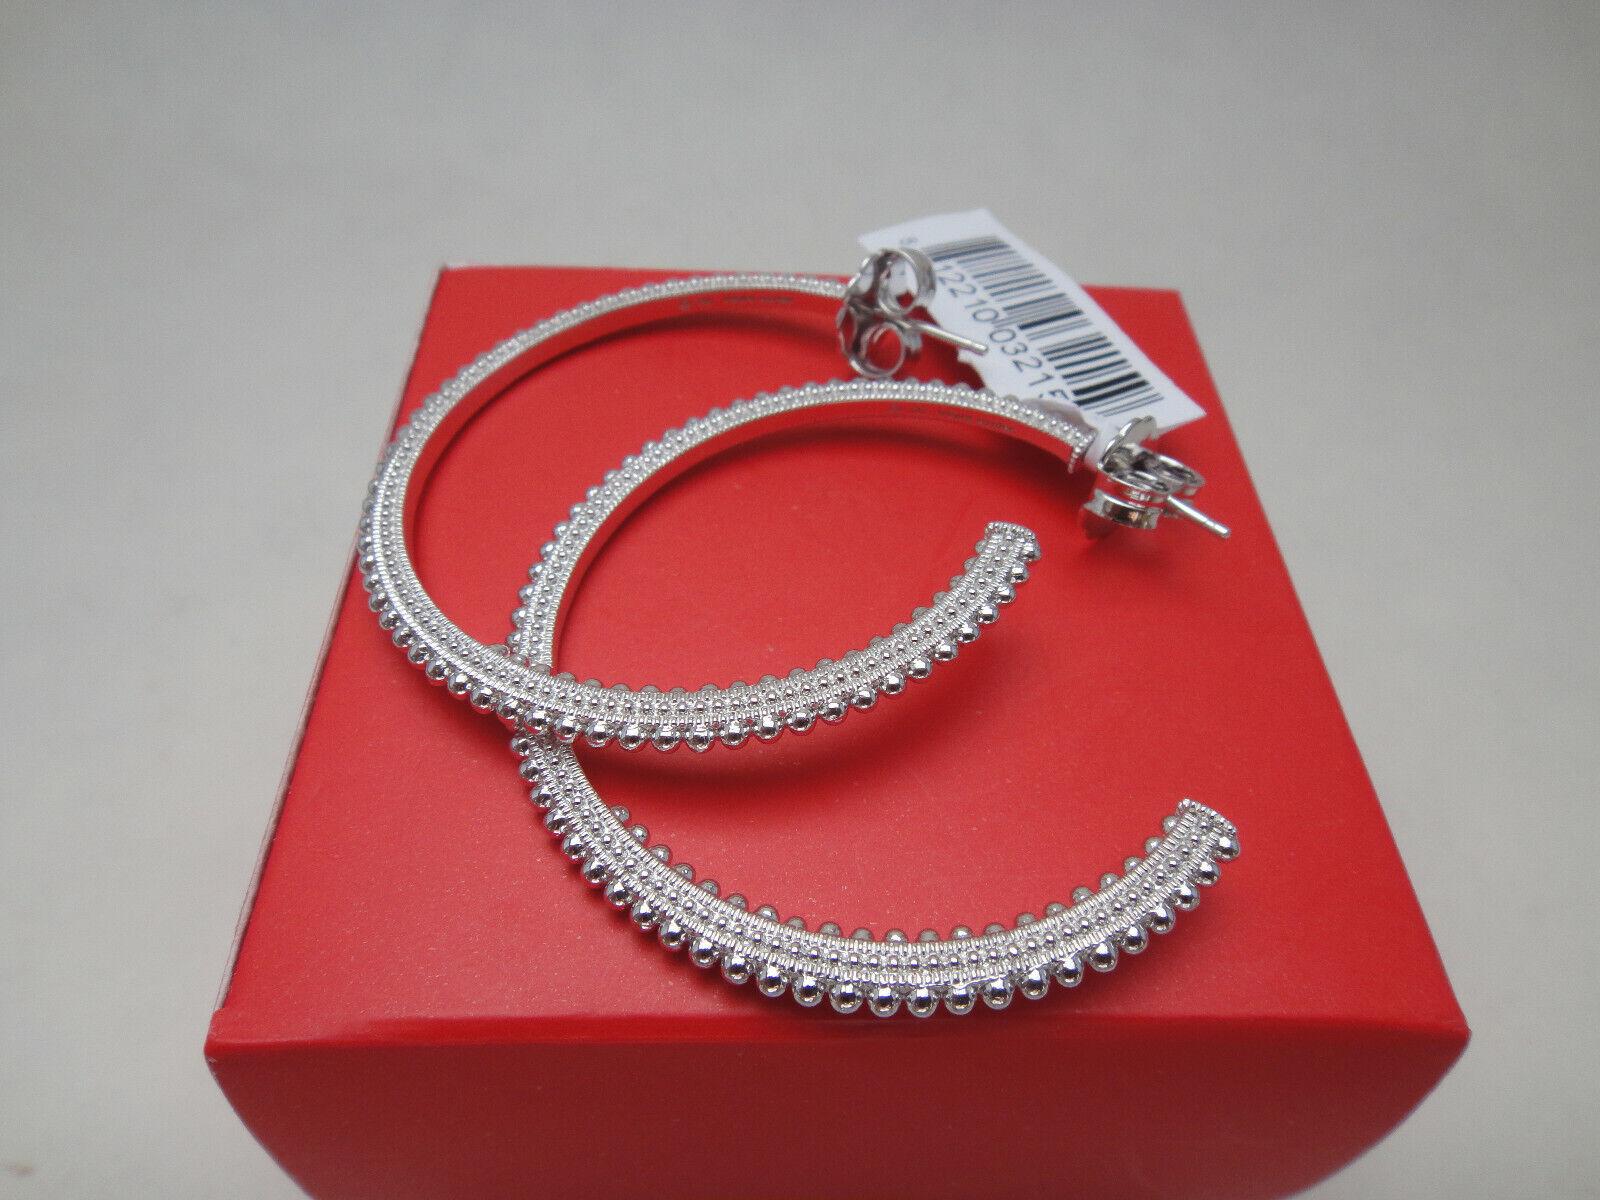 59dad224f4727 Judith Ripka Sterling Silver Classic Beaded 46mm Hoop Earrings